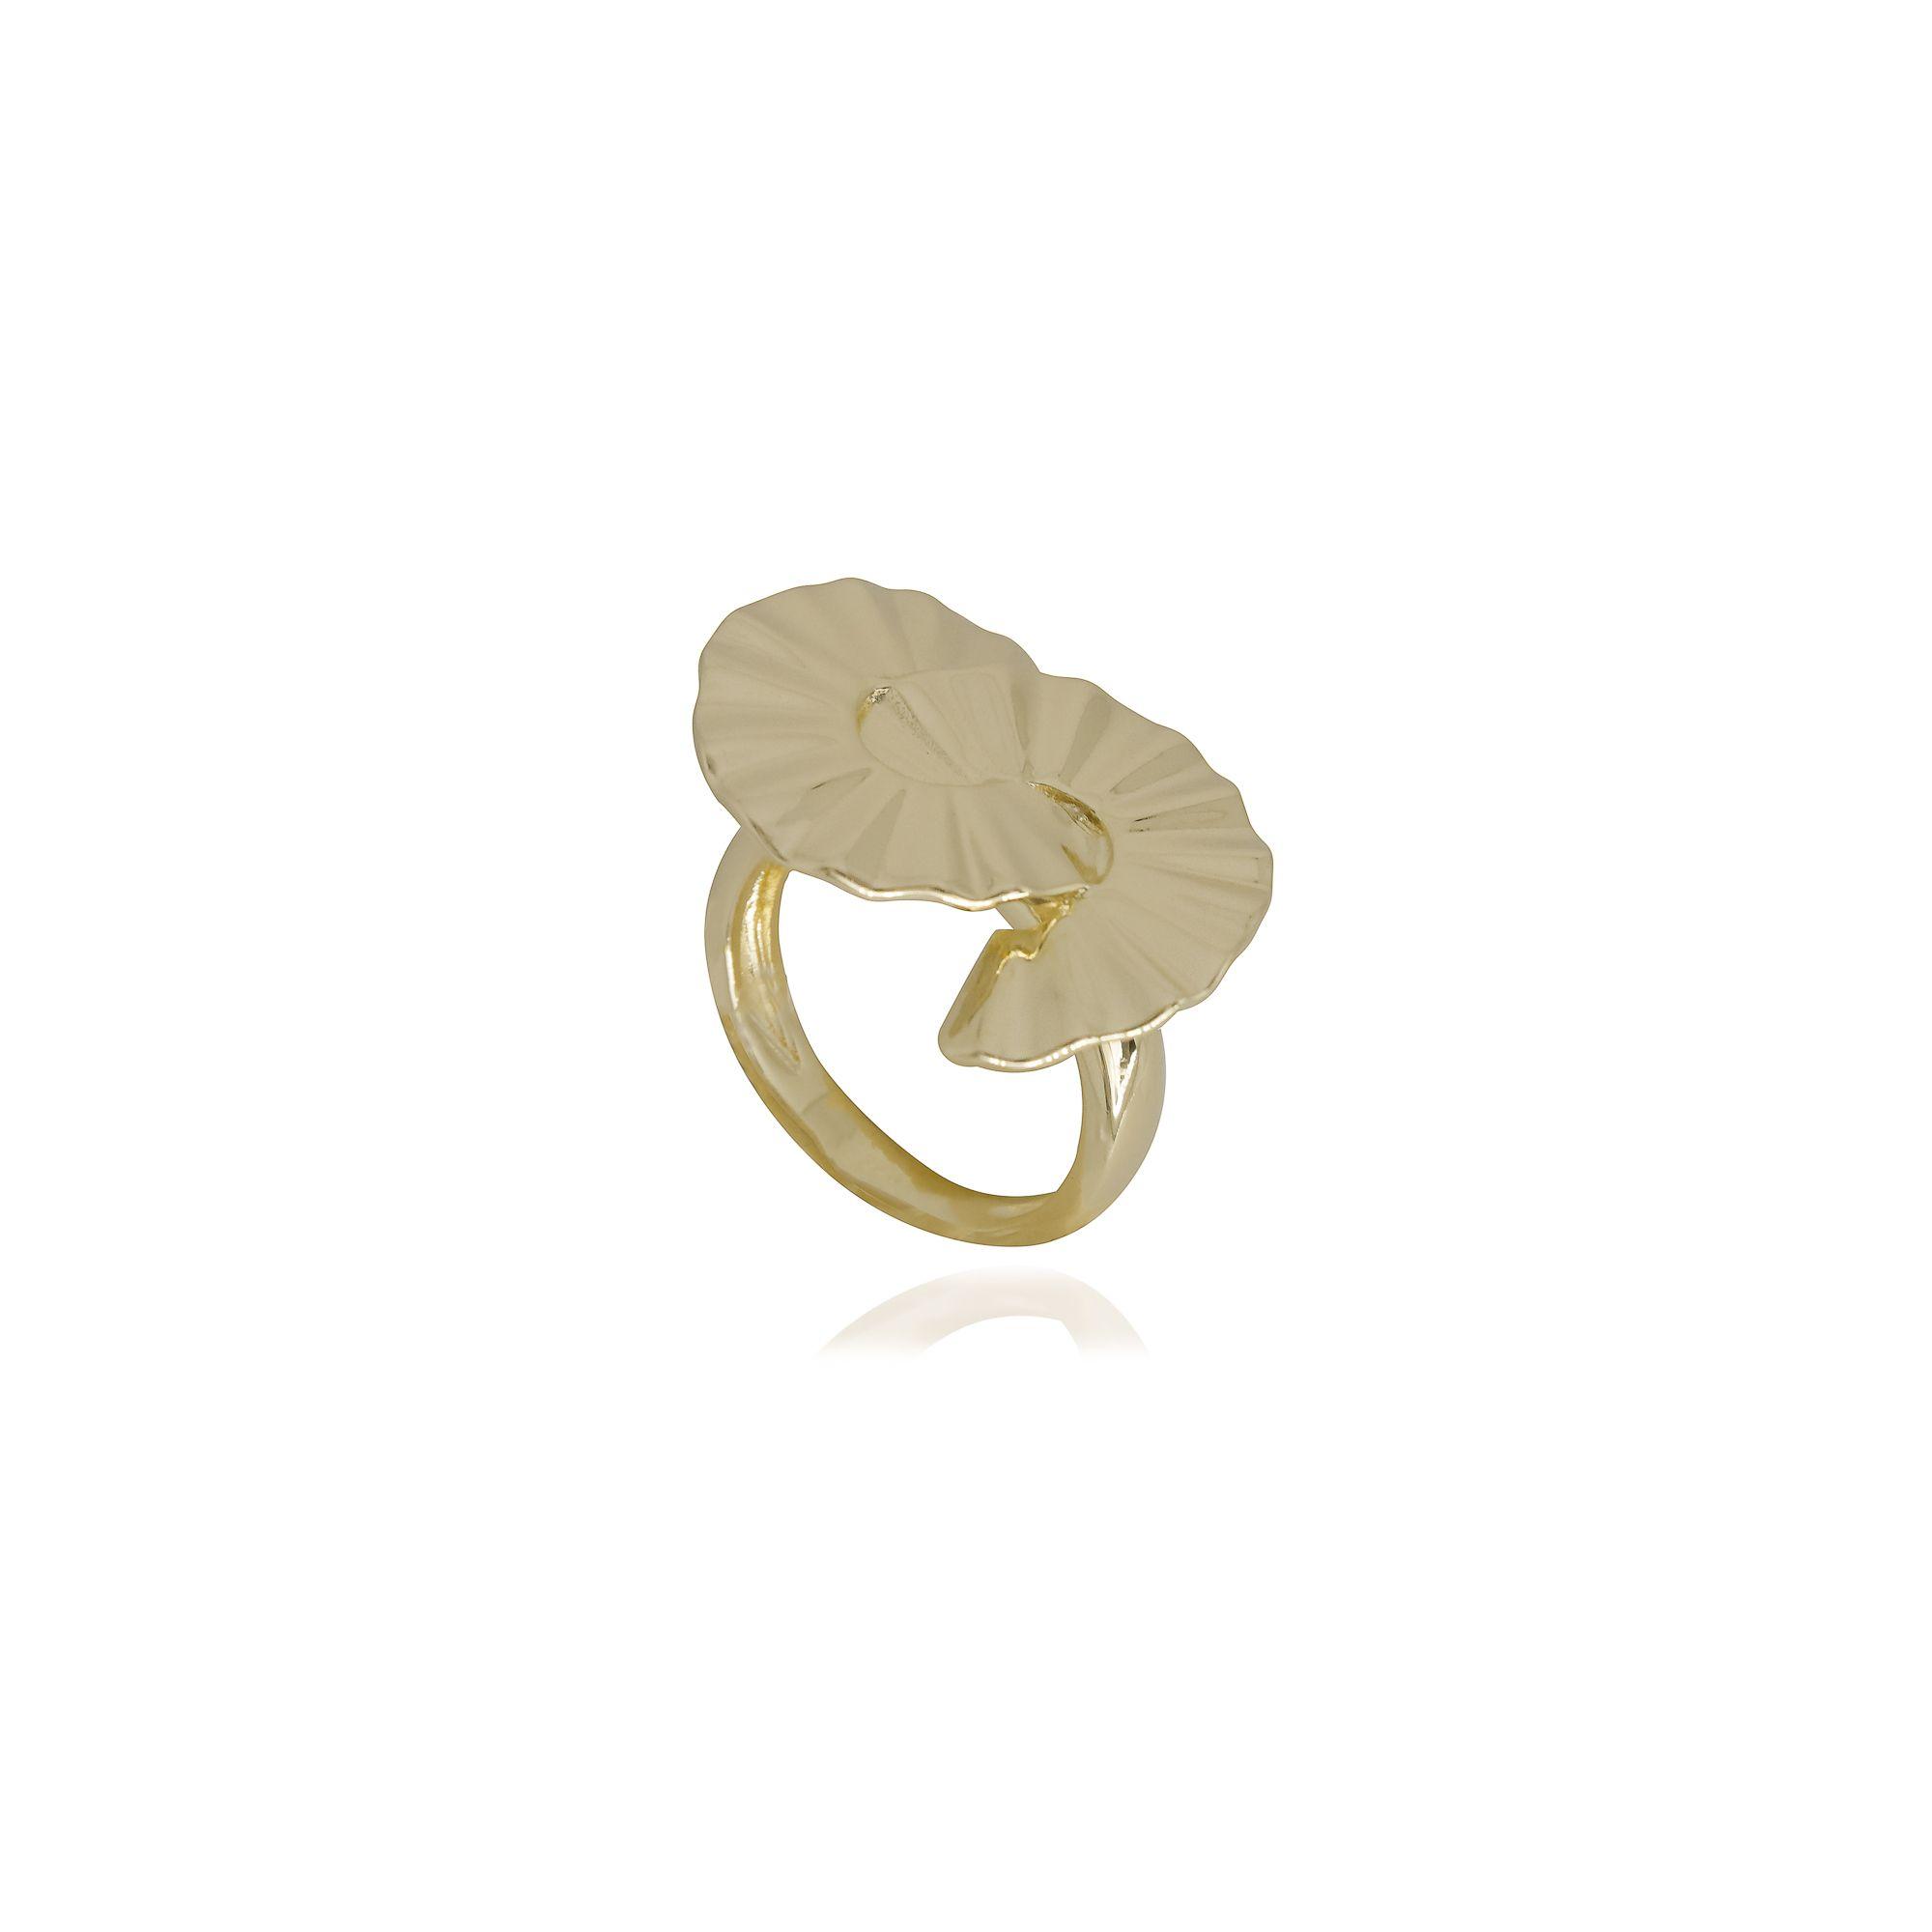 Anel semi joia Classic banhado a ouro 18k ou rhodium